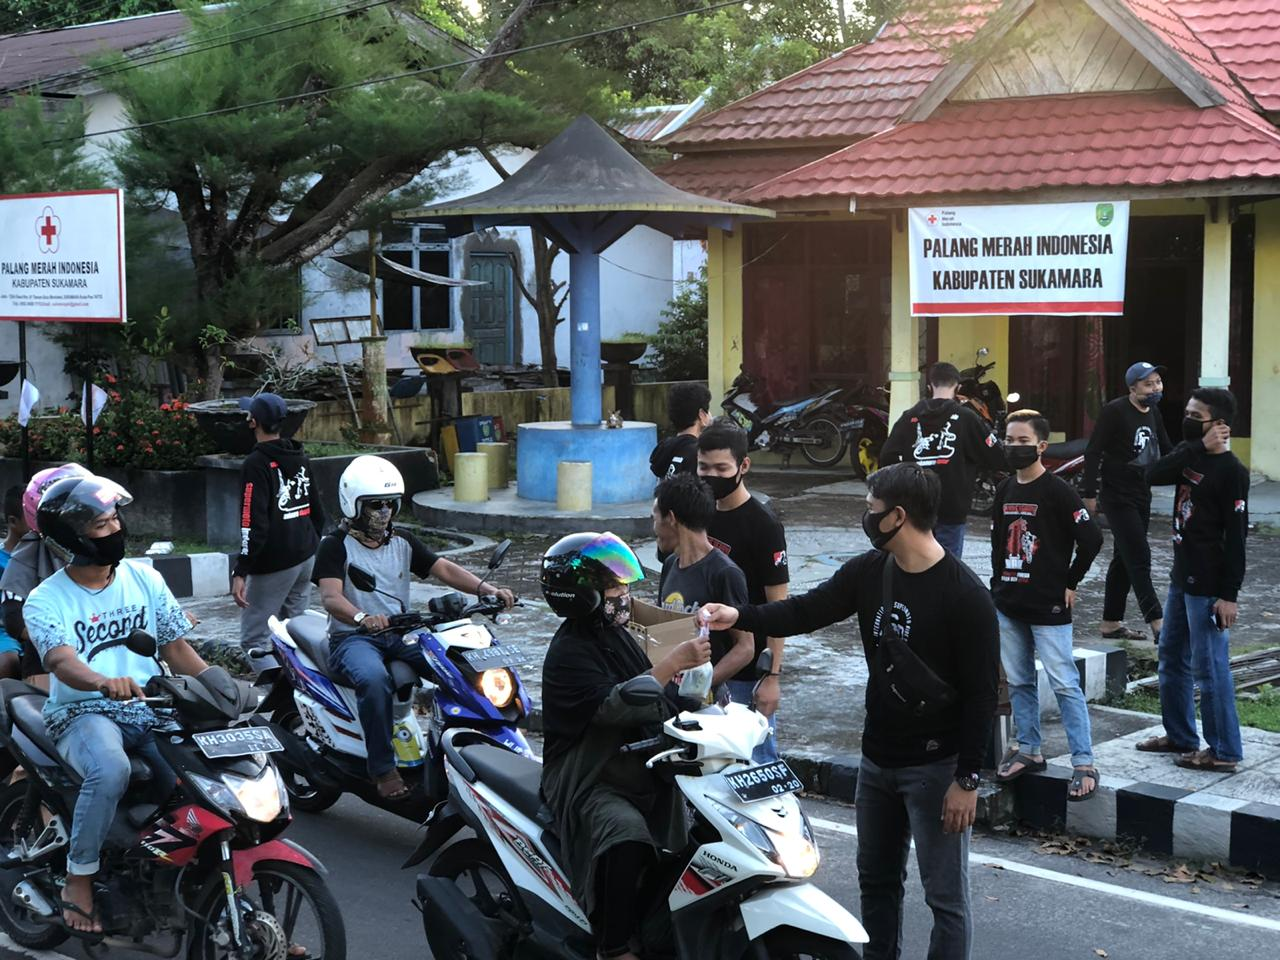 Bagikan Takjil, SMI Sukamara Ajak Bikers Peduli Sesama